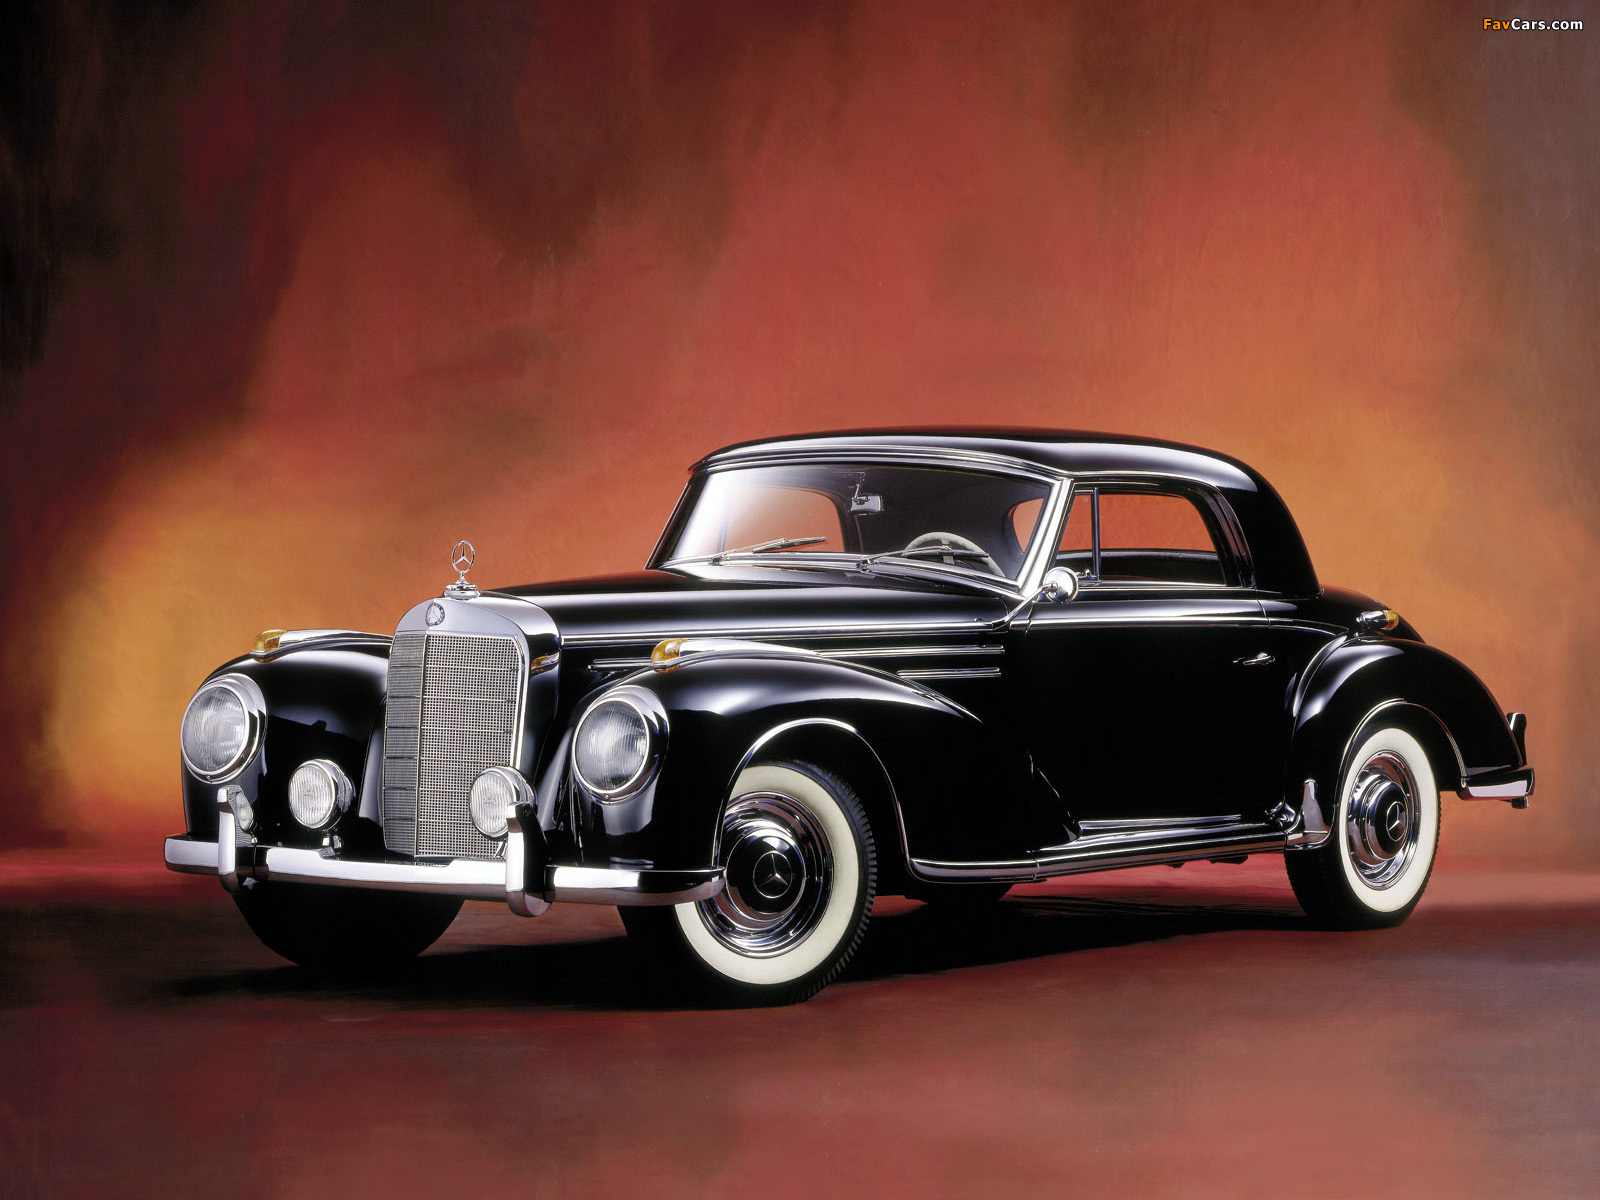 Mercedes benz 300sc w188 1955 58 photos 1600x1200 for 1955 mercedes benz